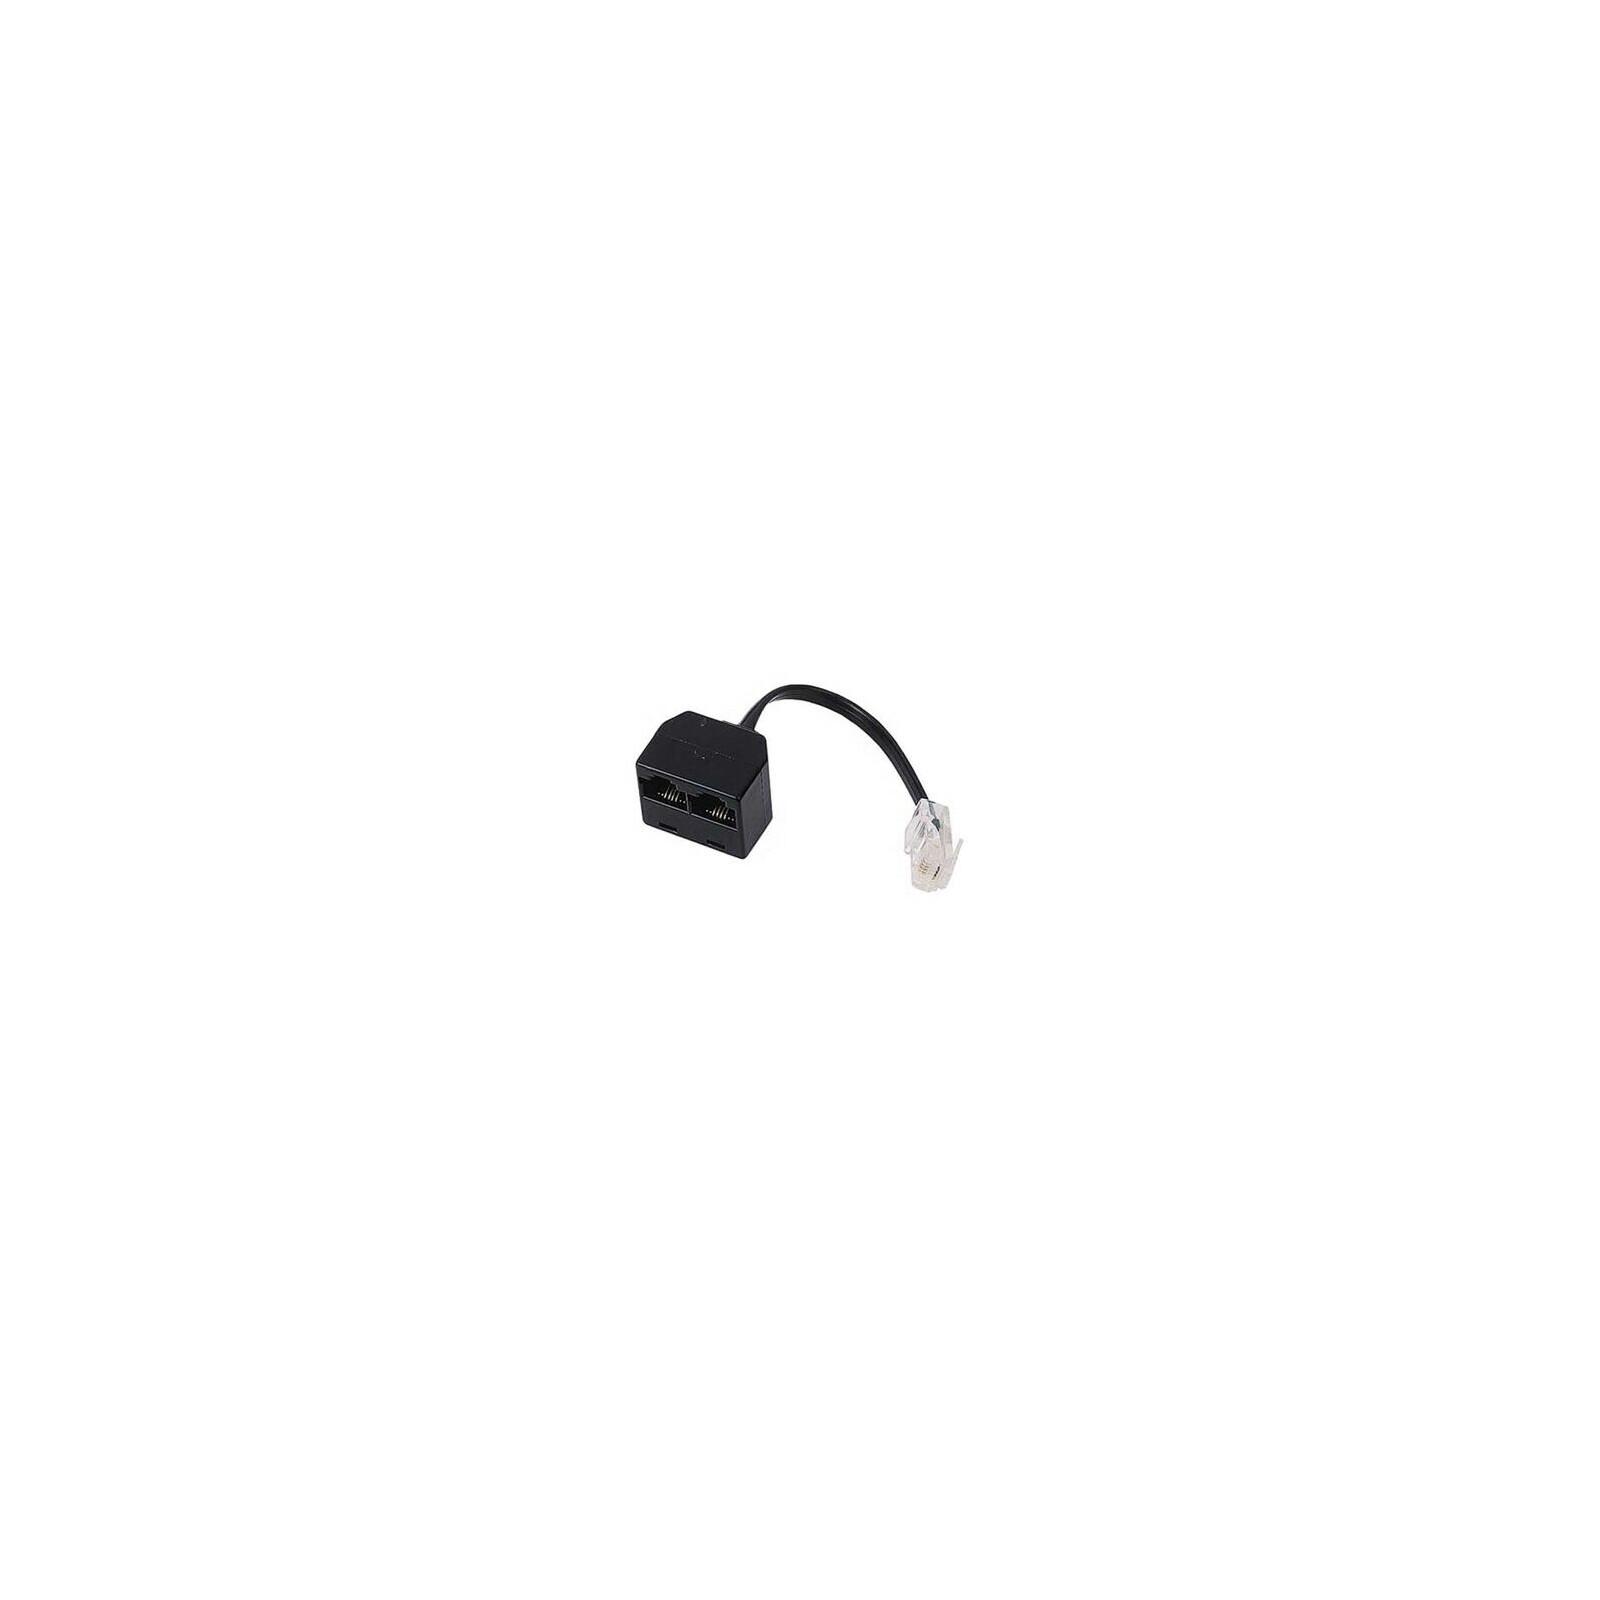 Hama 44544 ISDN-Verteiler Modular-Stecker 8p4c - 2 Modular-K